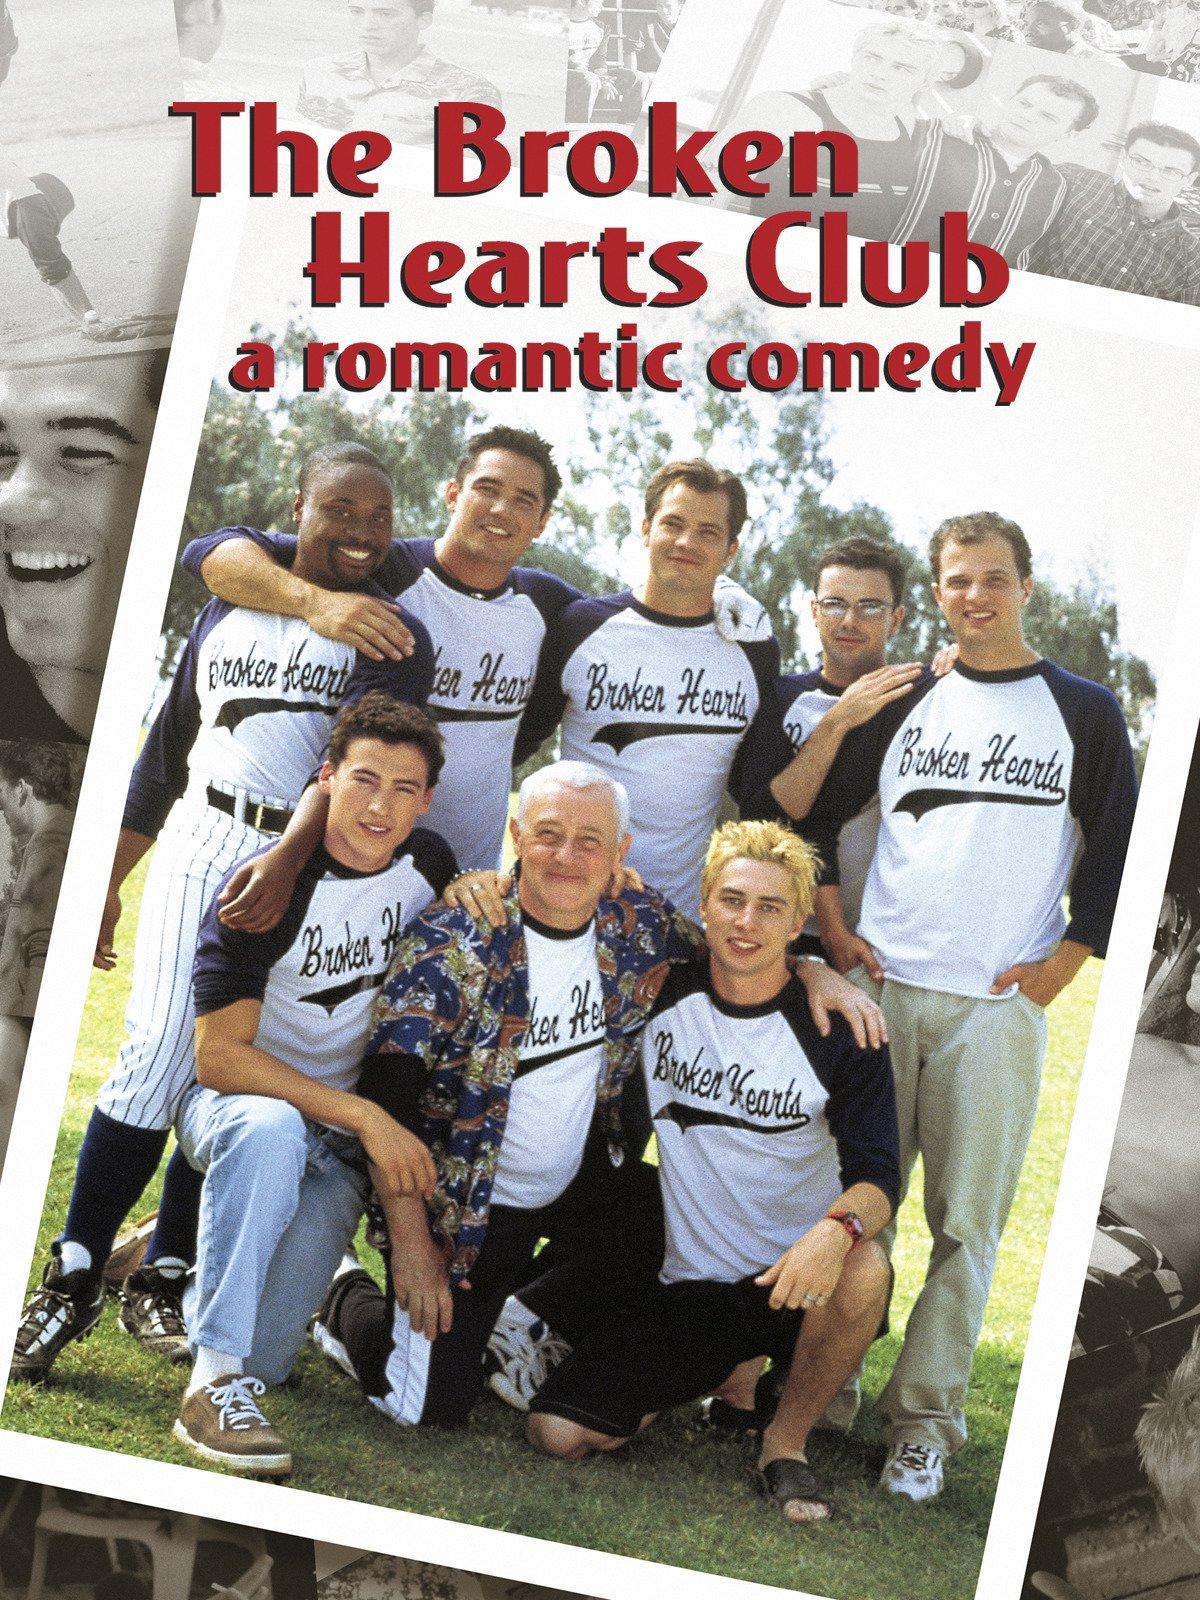 Broken Hearts Club: A Romantic Comedy, The